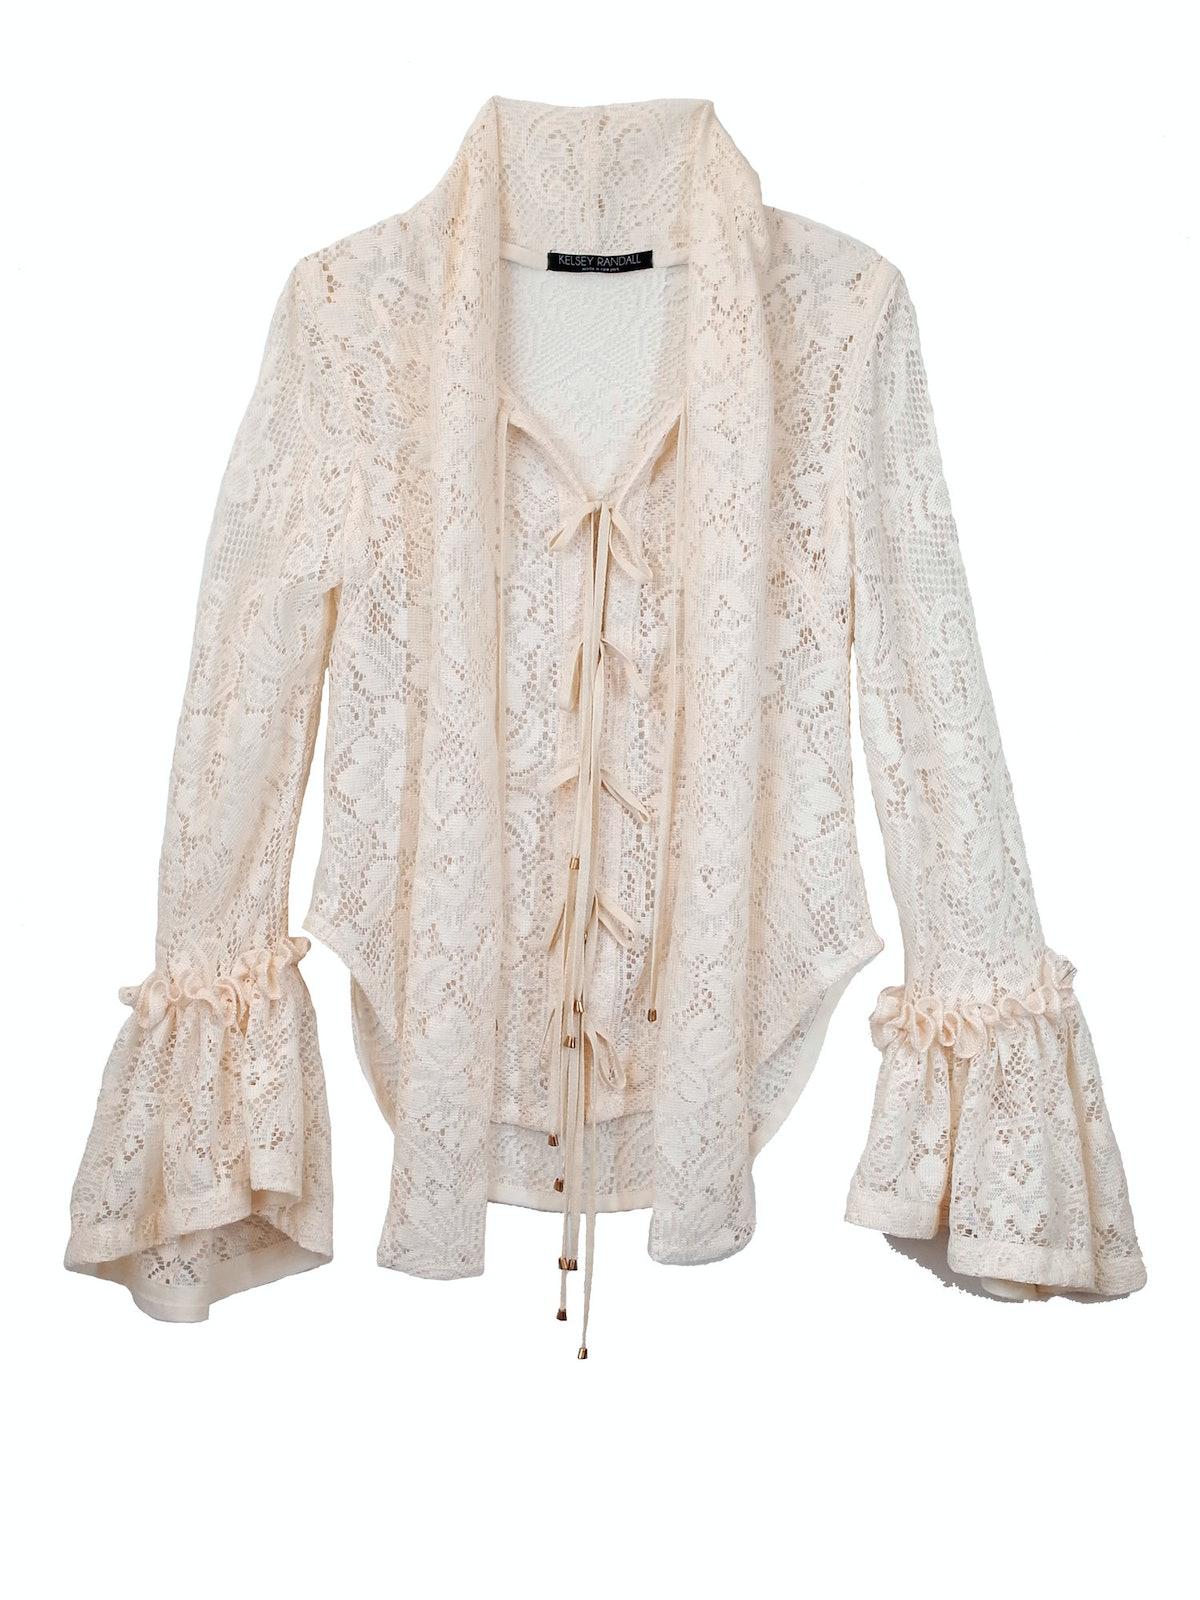 Kelsey Randall Prince Lace Flounce Sleeve Tie Blouse